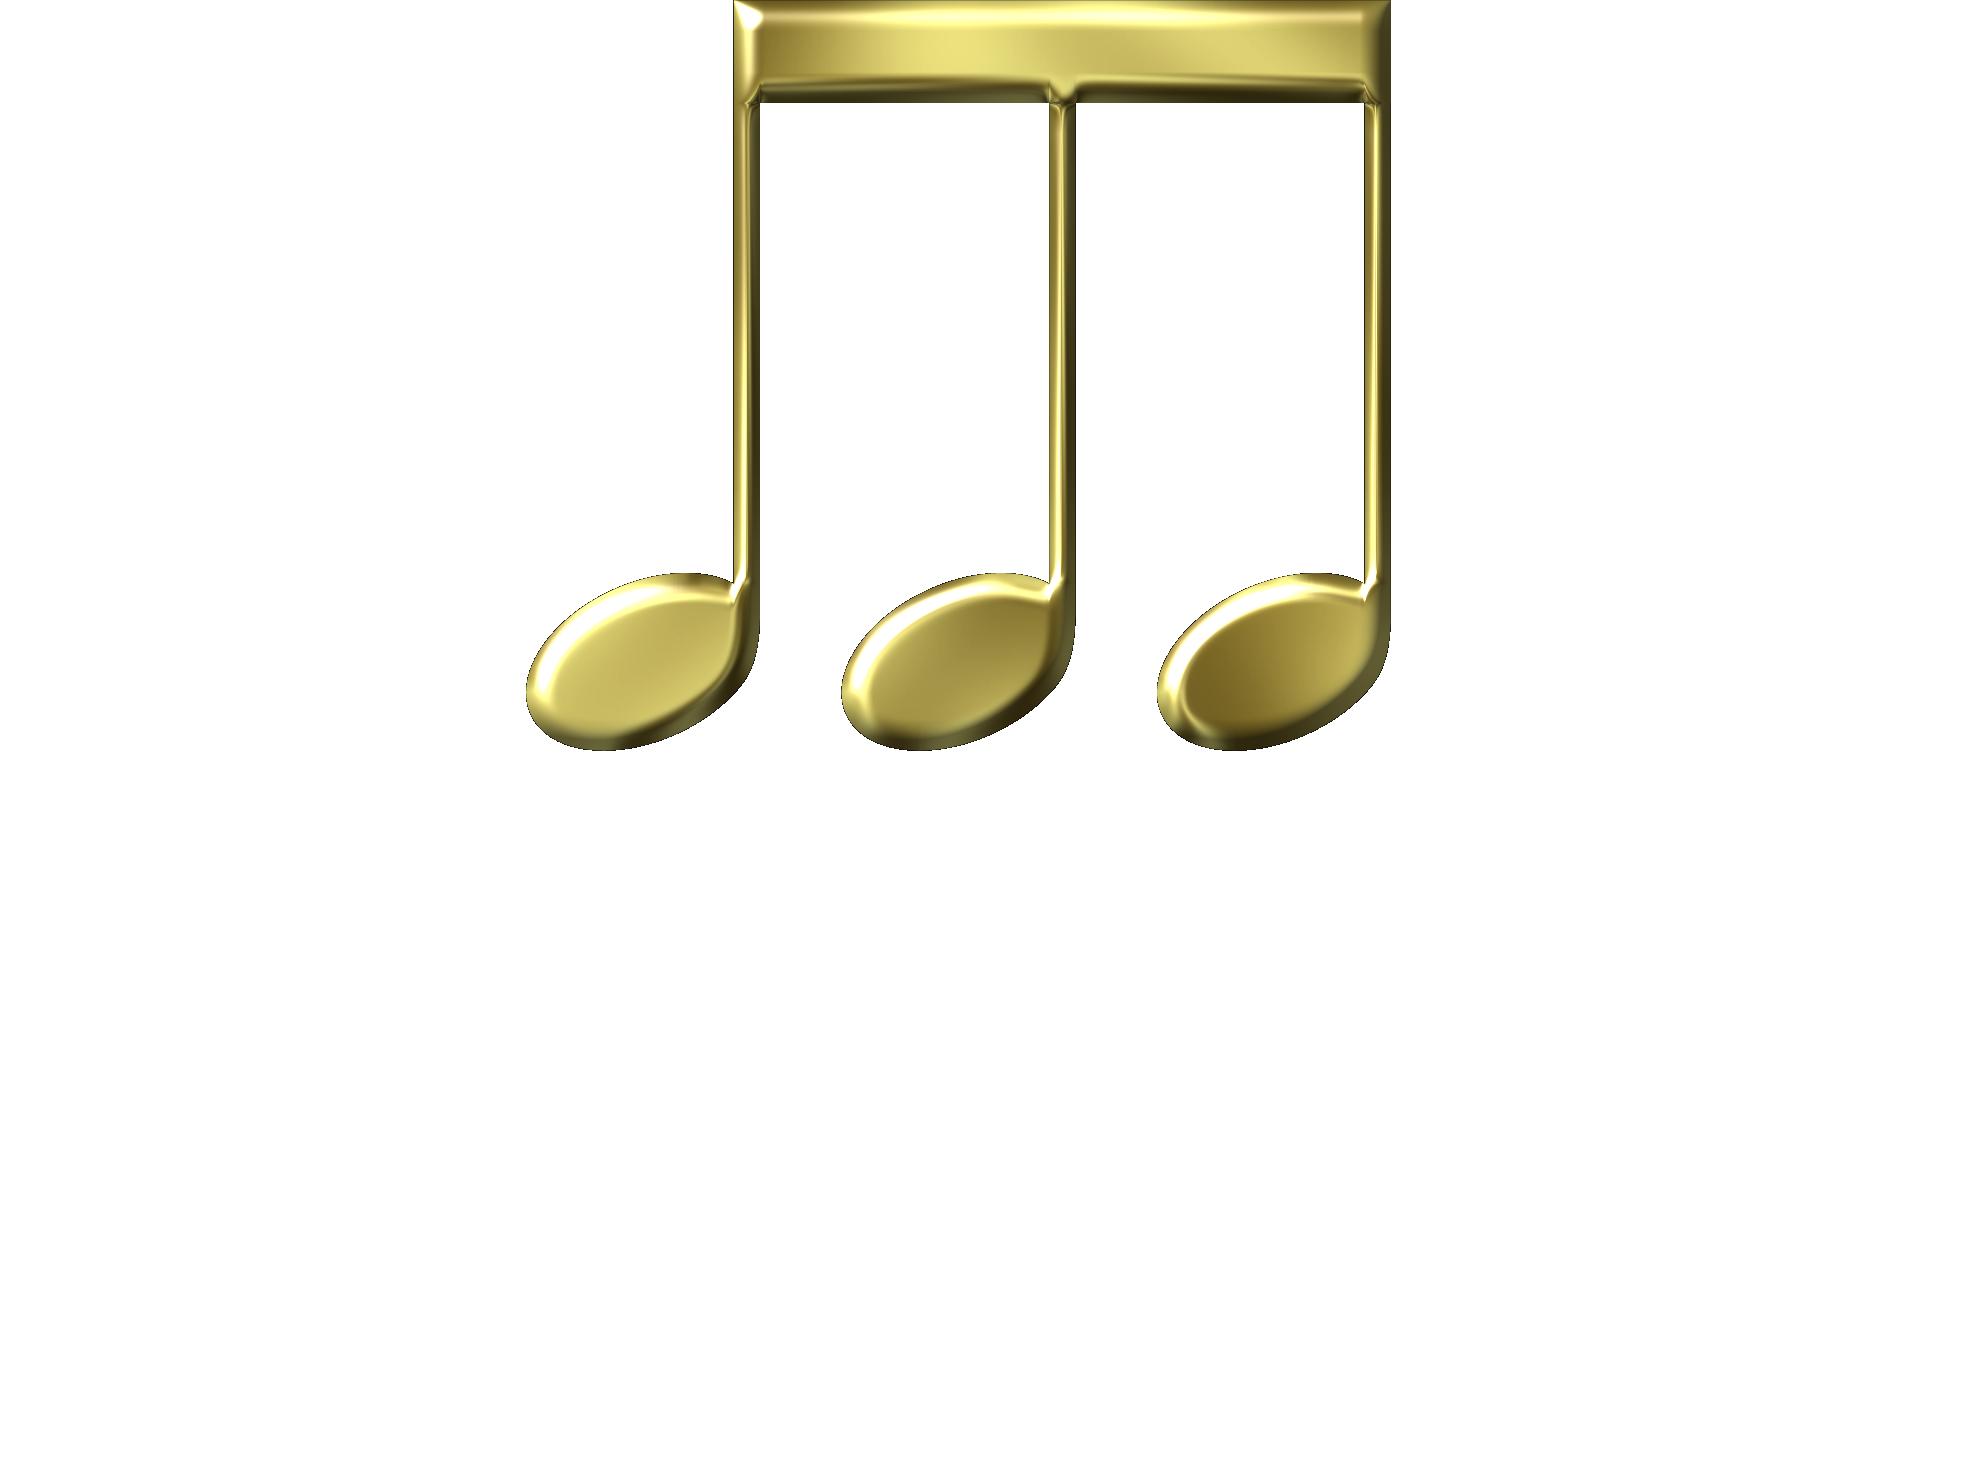 Mulder muziekinstrumenten